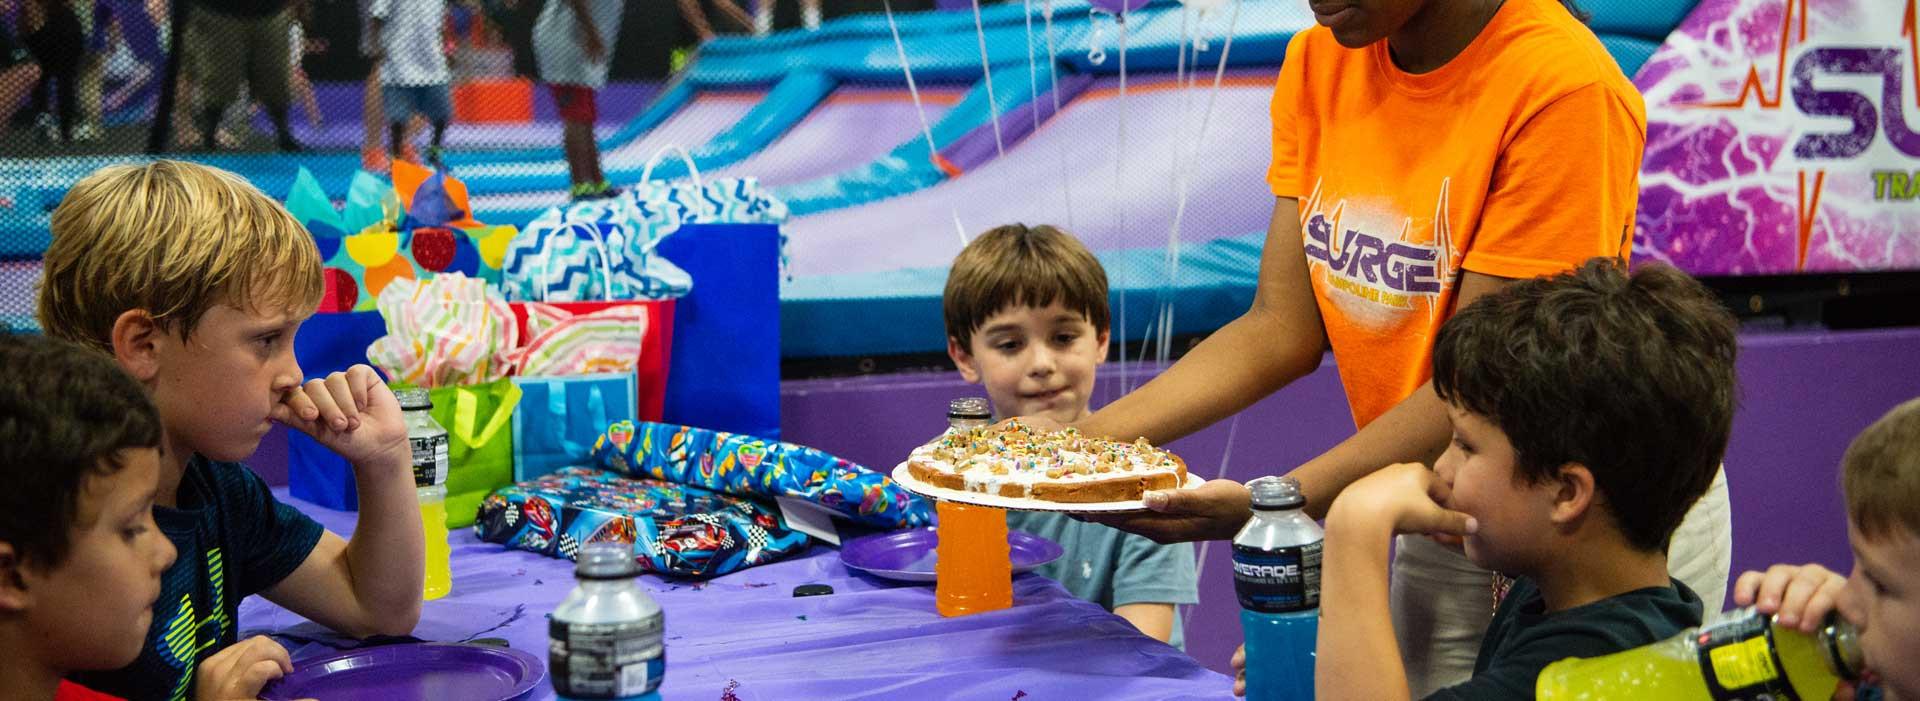 Birthday Party Ideas Virginia Beach  Virginia Beach VA – Trampoline Park Parties and group events